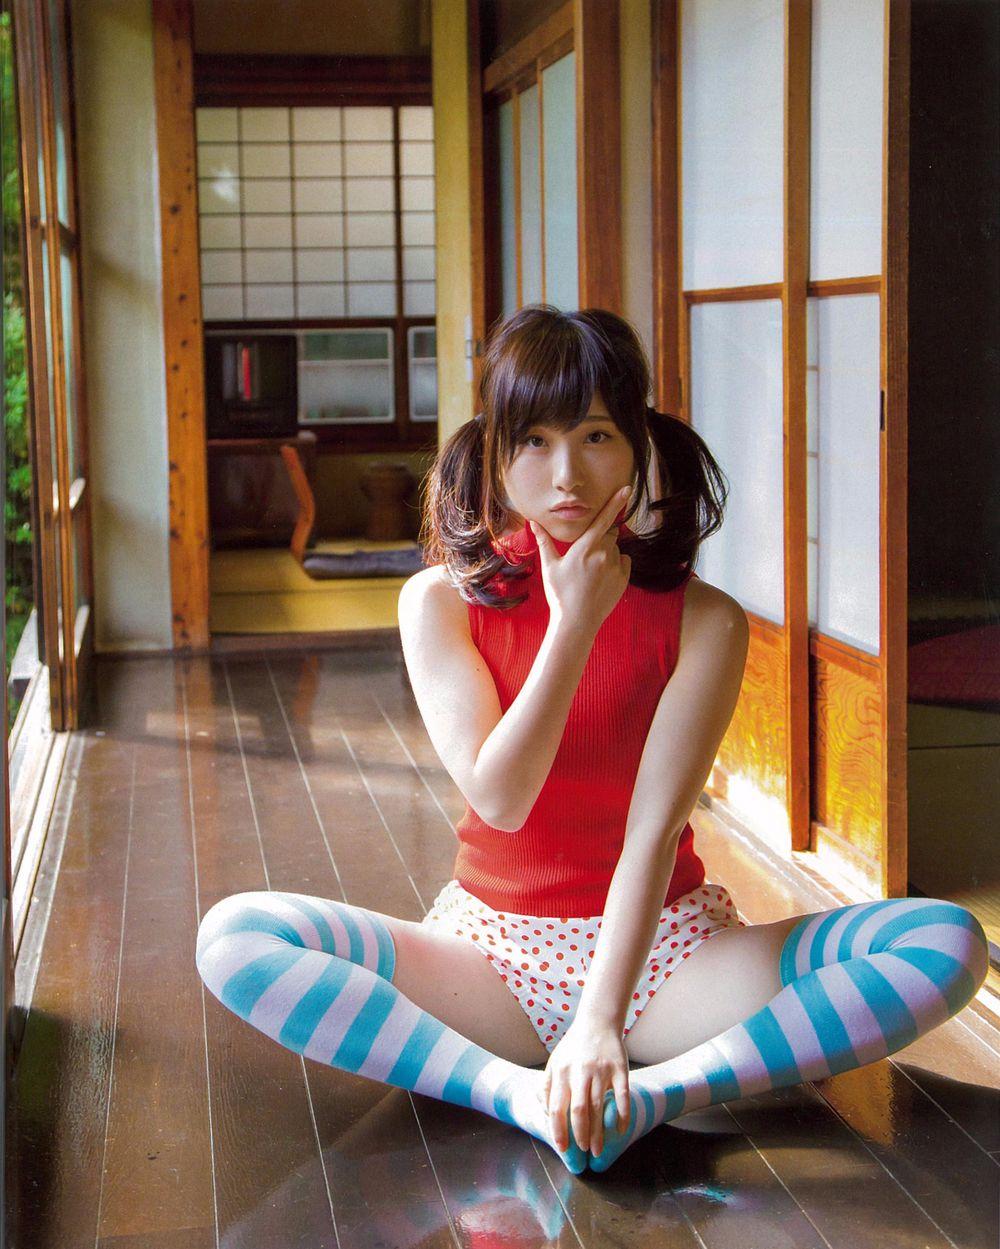 Naomi Kvetinas Nao Tl Set: Nao Kanzaki And A Few Friends: Juri Takahashi: Magazine